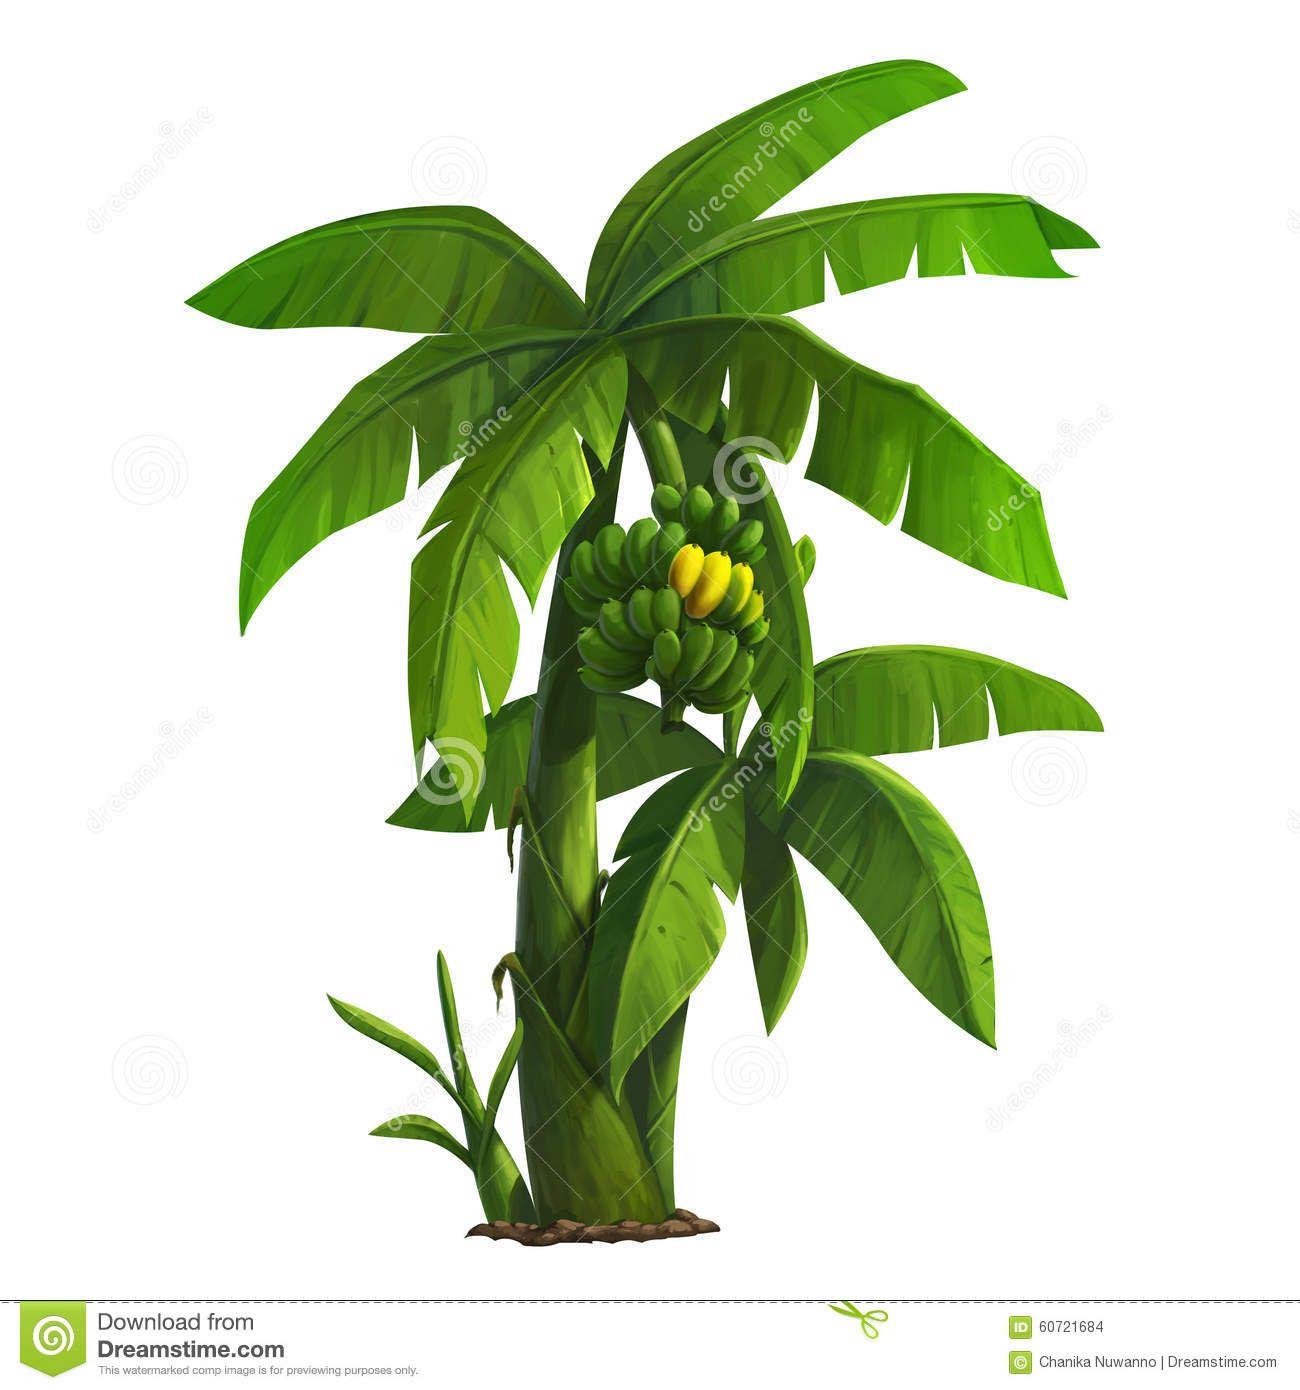 Banana Tree Stock Illustration Illustration Of Banana 60721684 Tree Illustration Banana Tree Plant Drawing